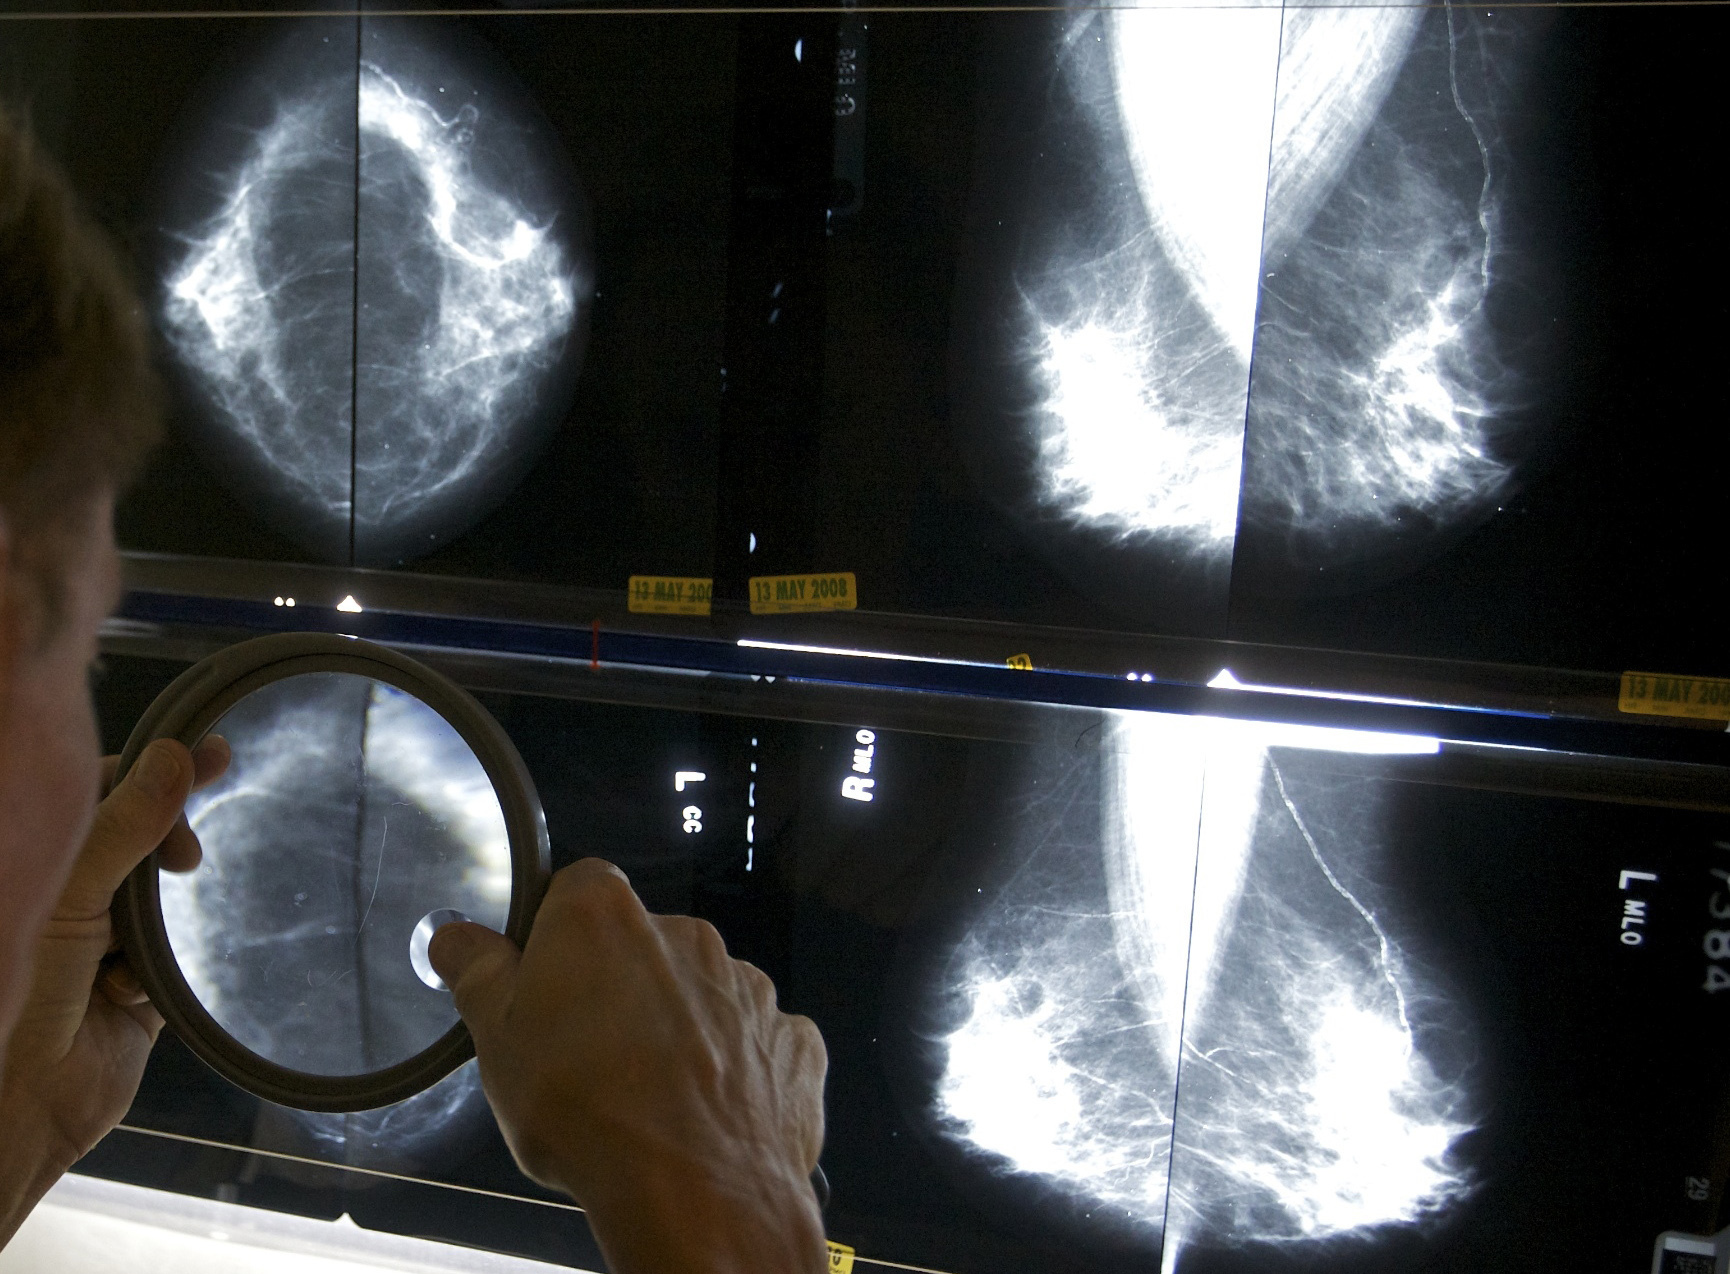 Mammograms_Standards_40501-159532.jpg75171724